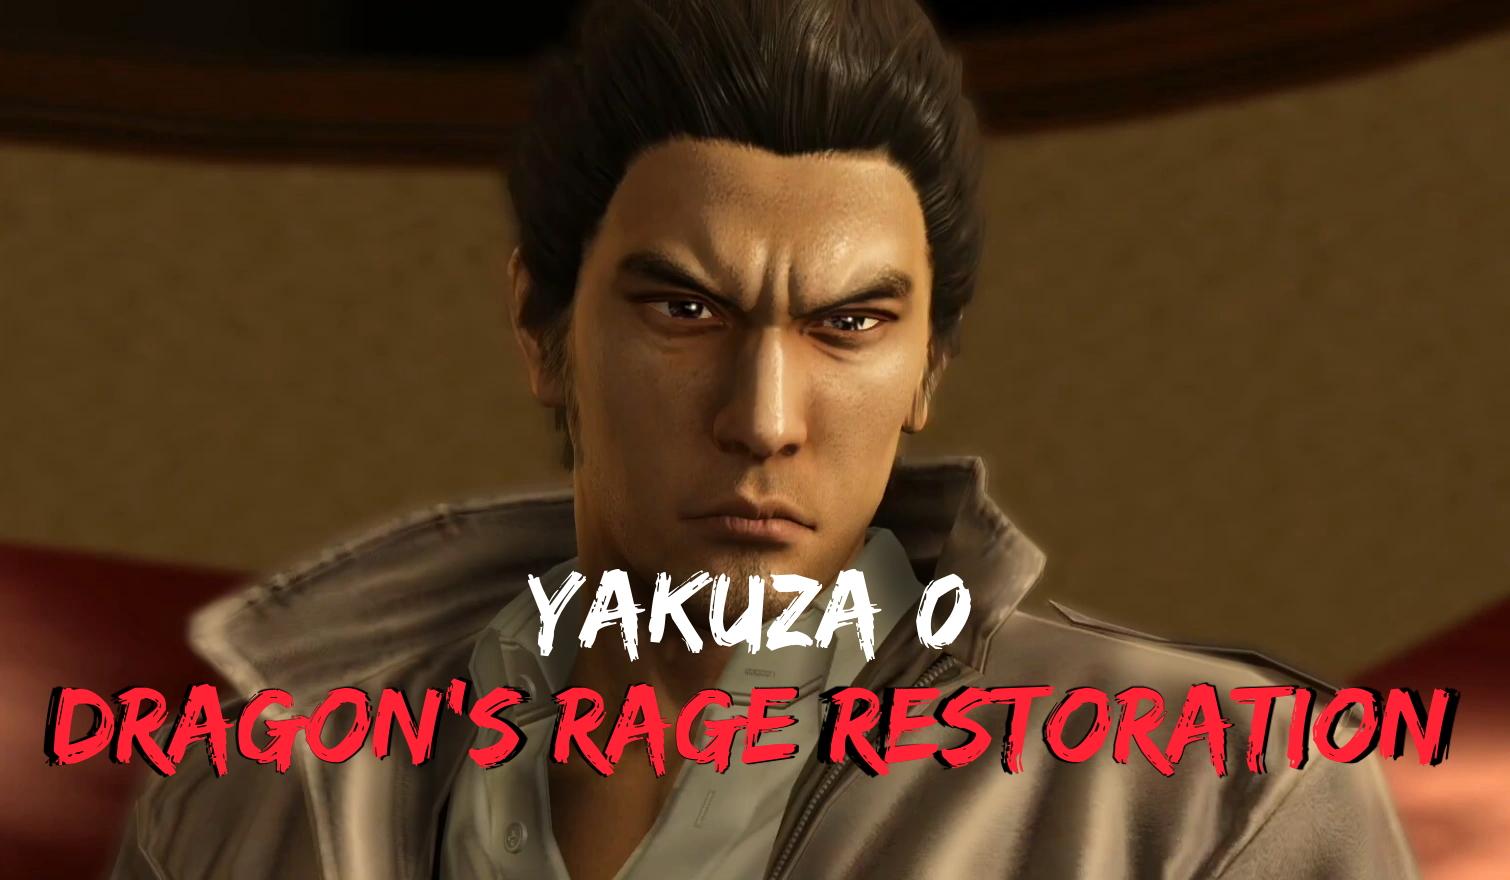 Dragon's Rage Restoration